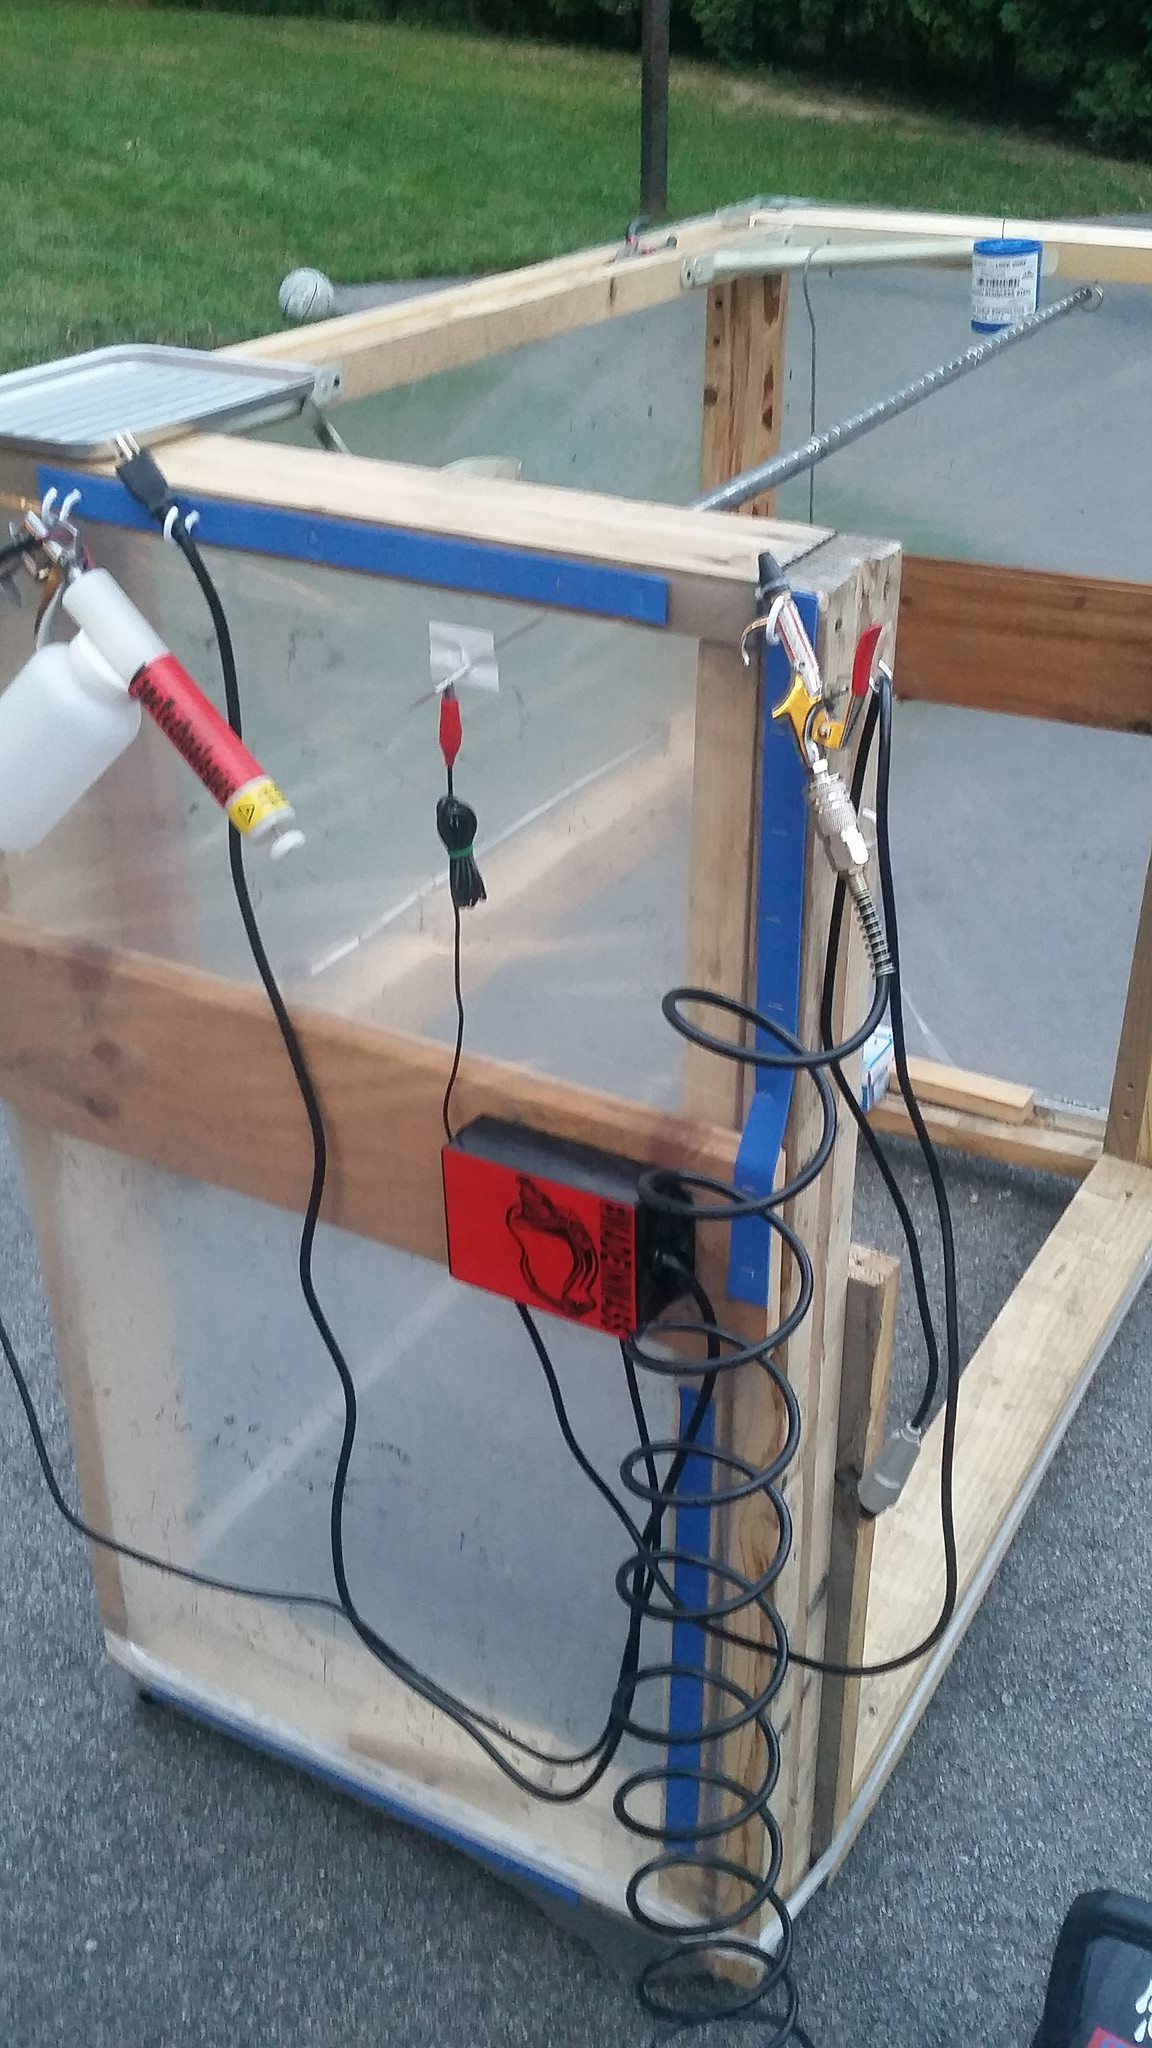 DIY Powder coating spray booth. Learn to powder coat at